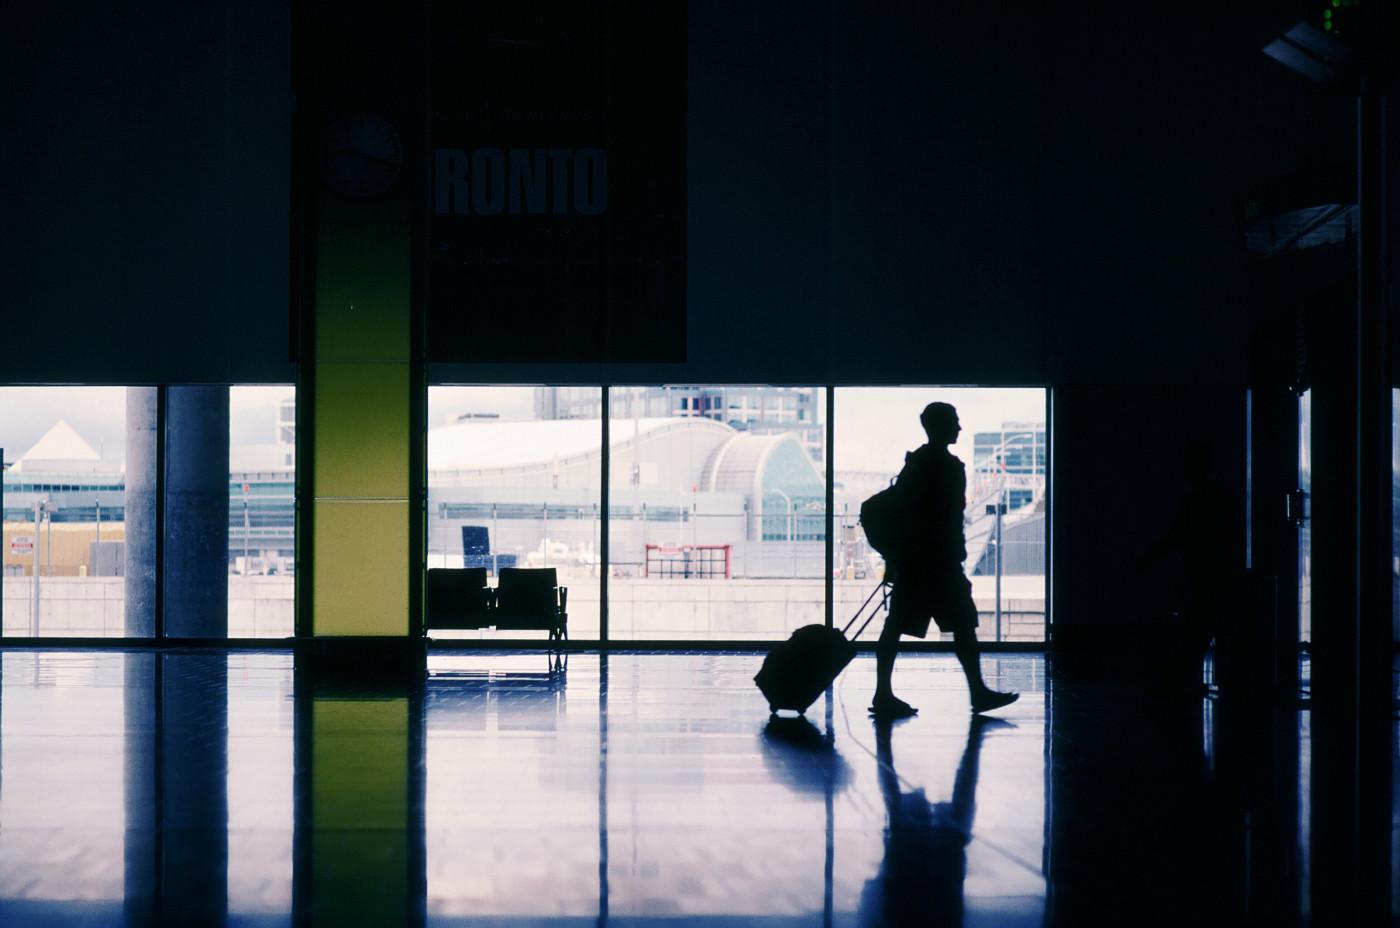 Coming Home (in Kodachrome 64), 2009 [KT2011001] [Idlewild]